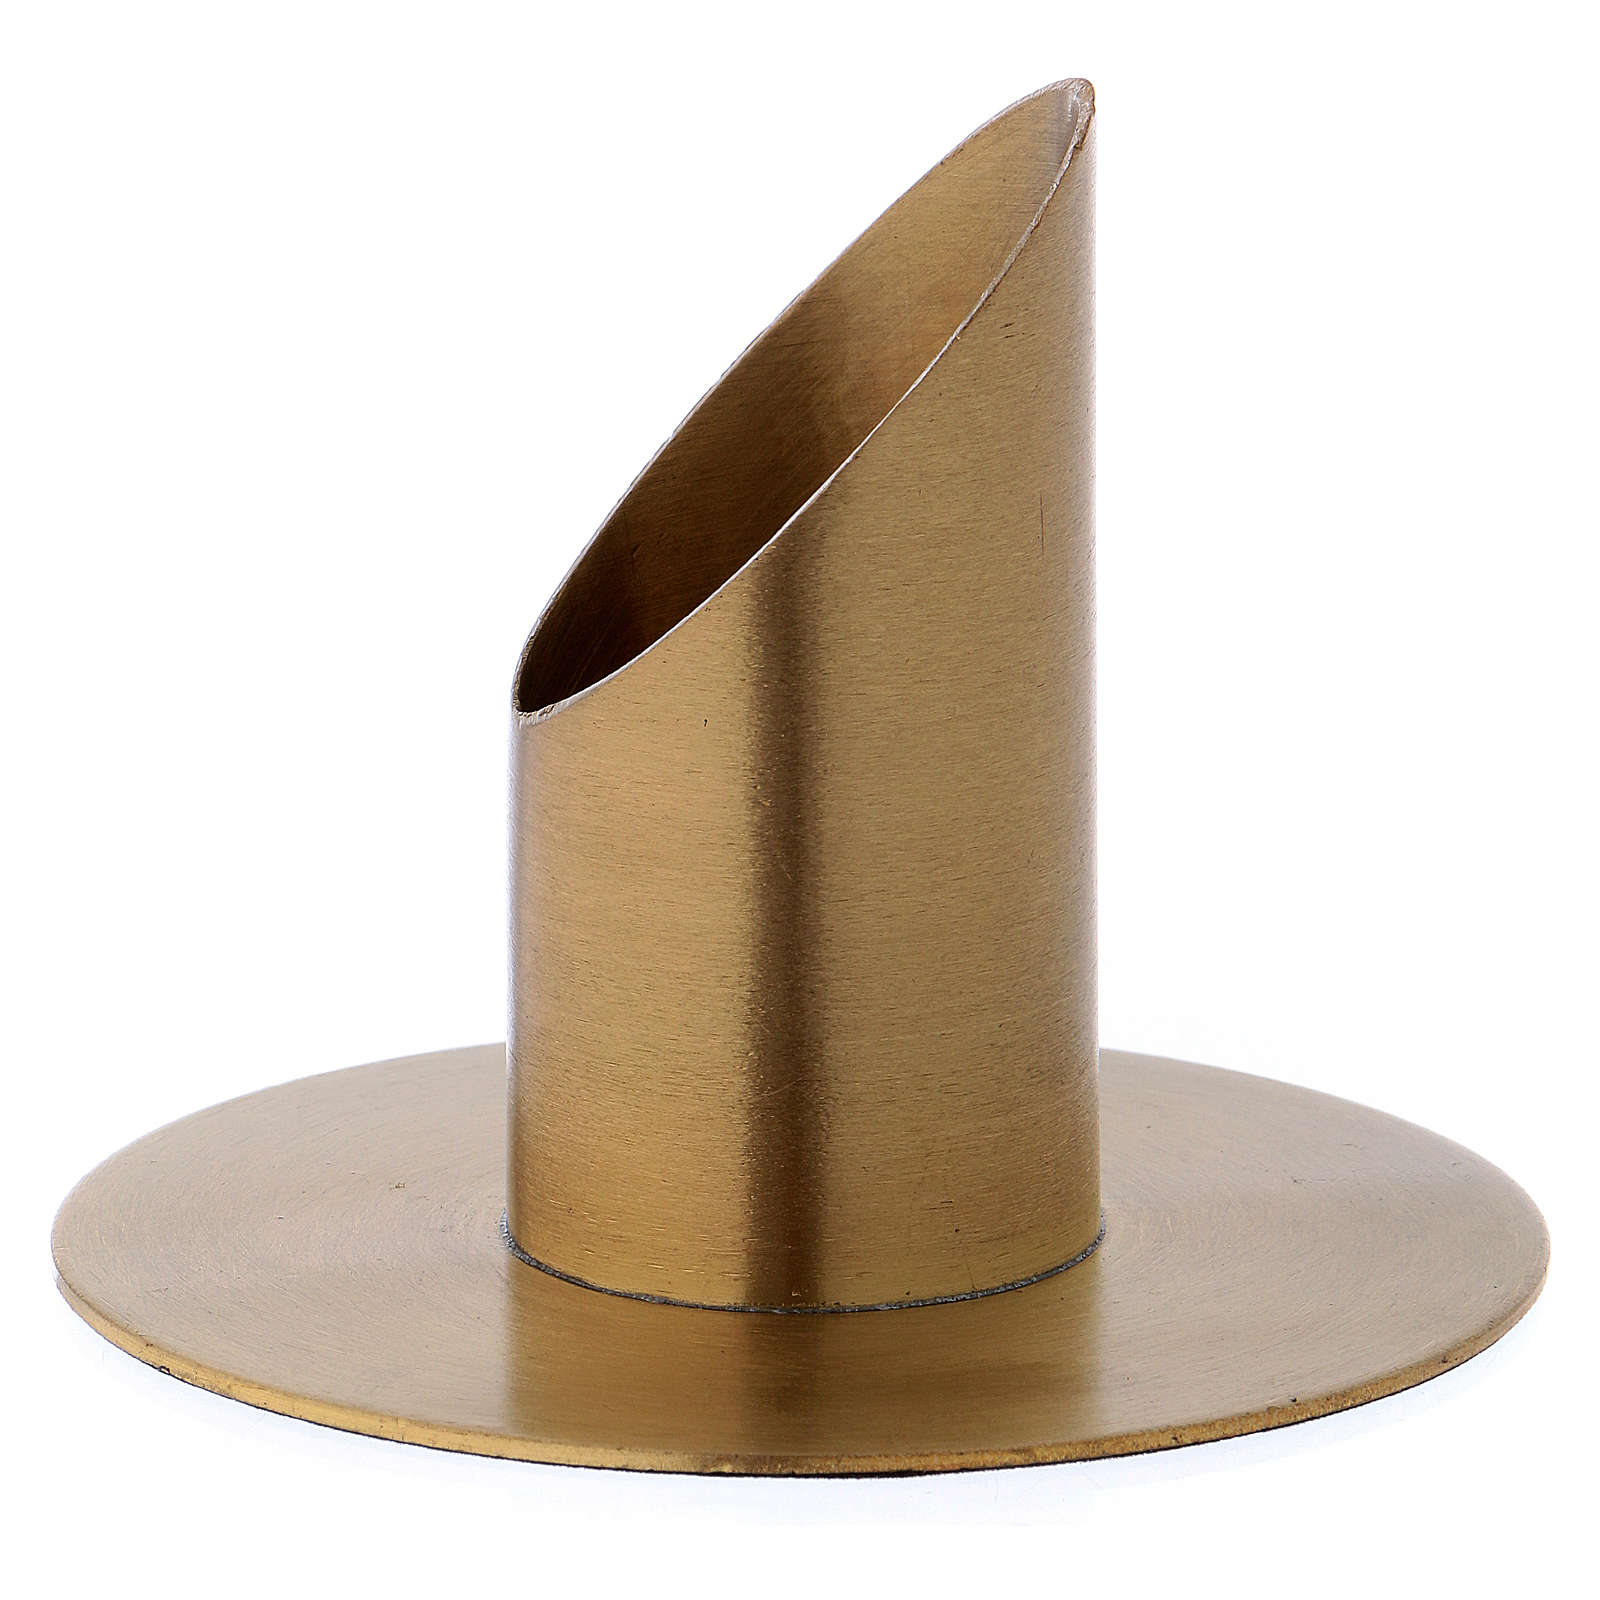 Portacandele forma cilindrica ottone dorato opaco per candela 3 cm 4